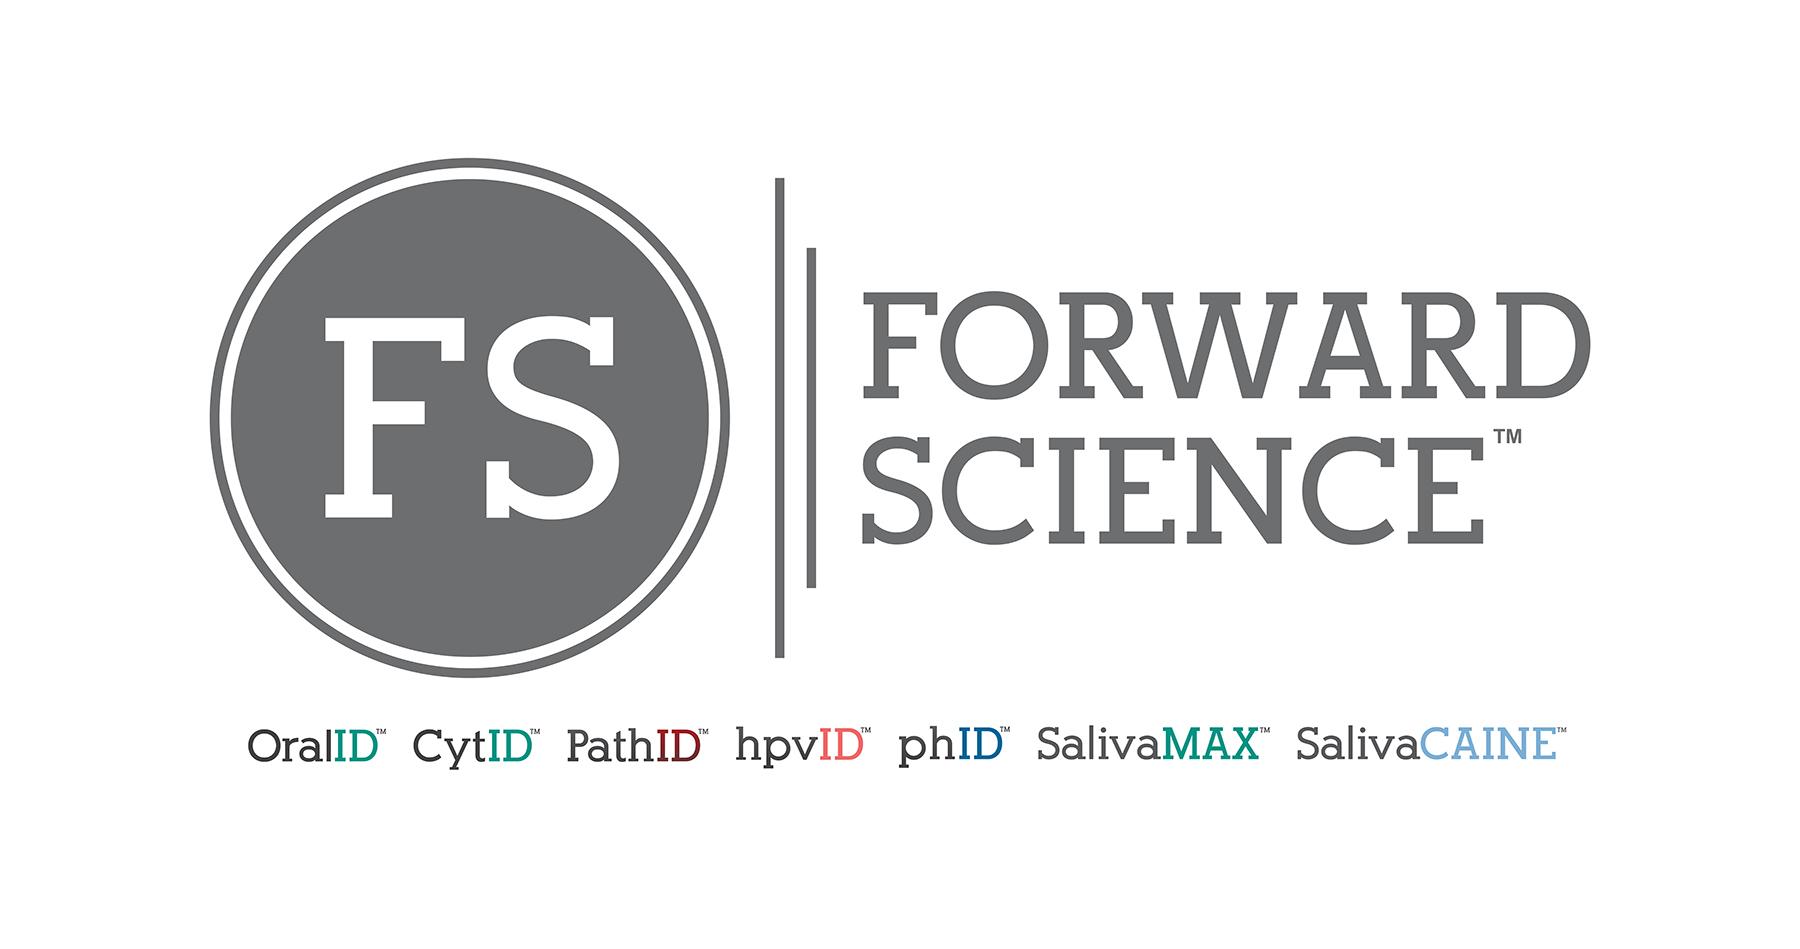 Forward Science